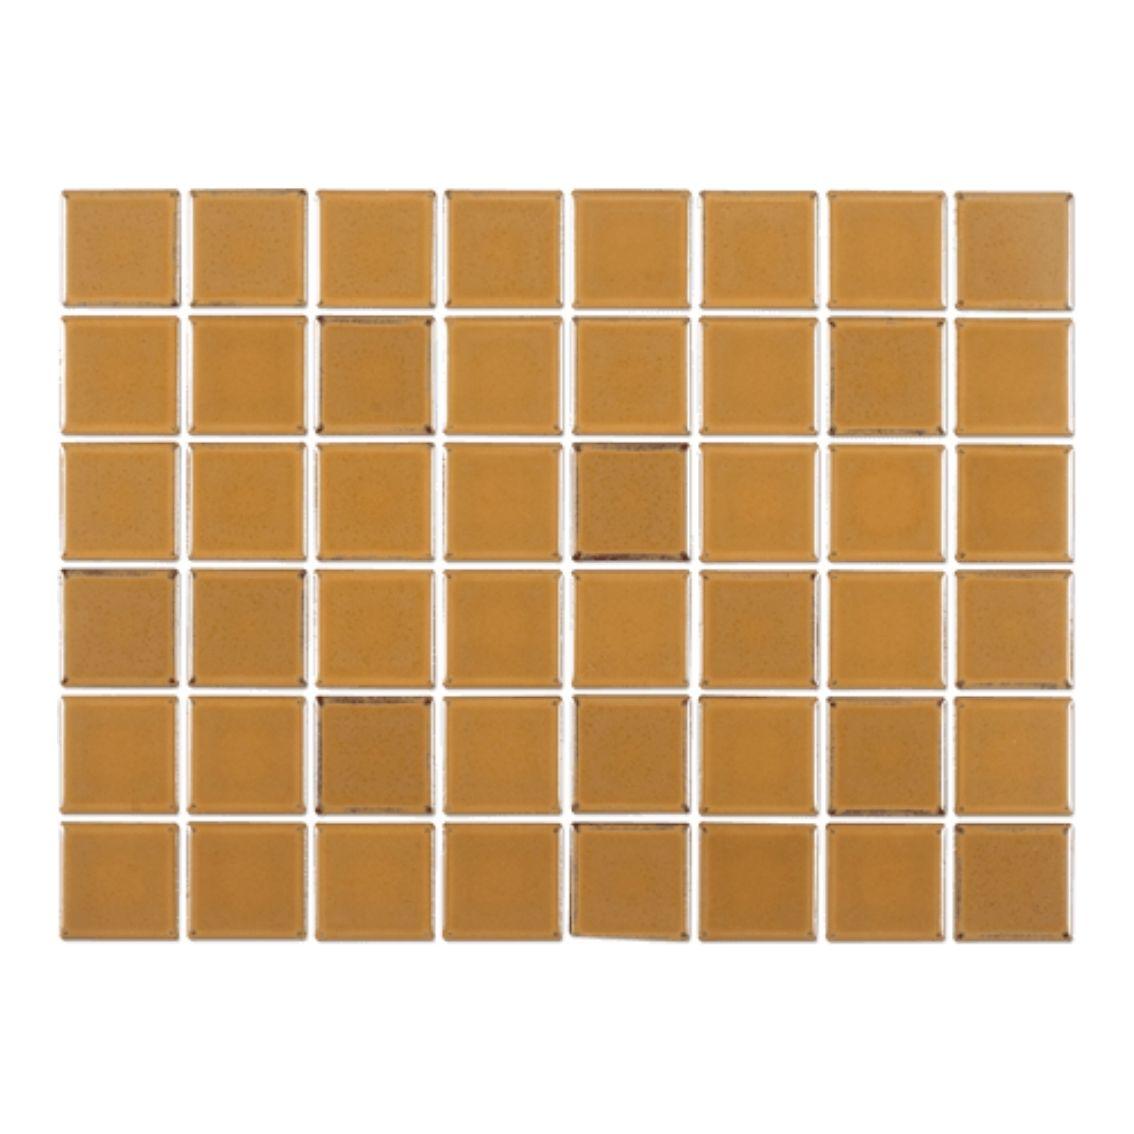 Pastilha Amarelo Diamantina 5x5 cm <br /><b>R$ 91,90 M² </b><br />Cx 1,08 M² <b> R$ 99,25</b>